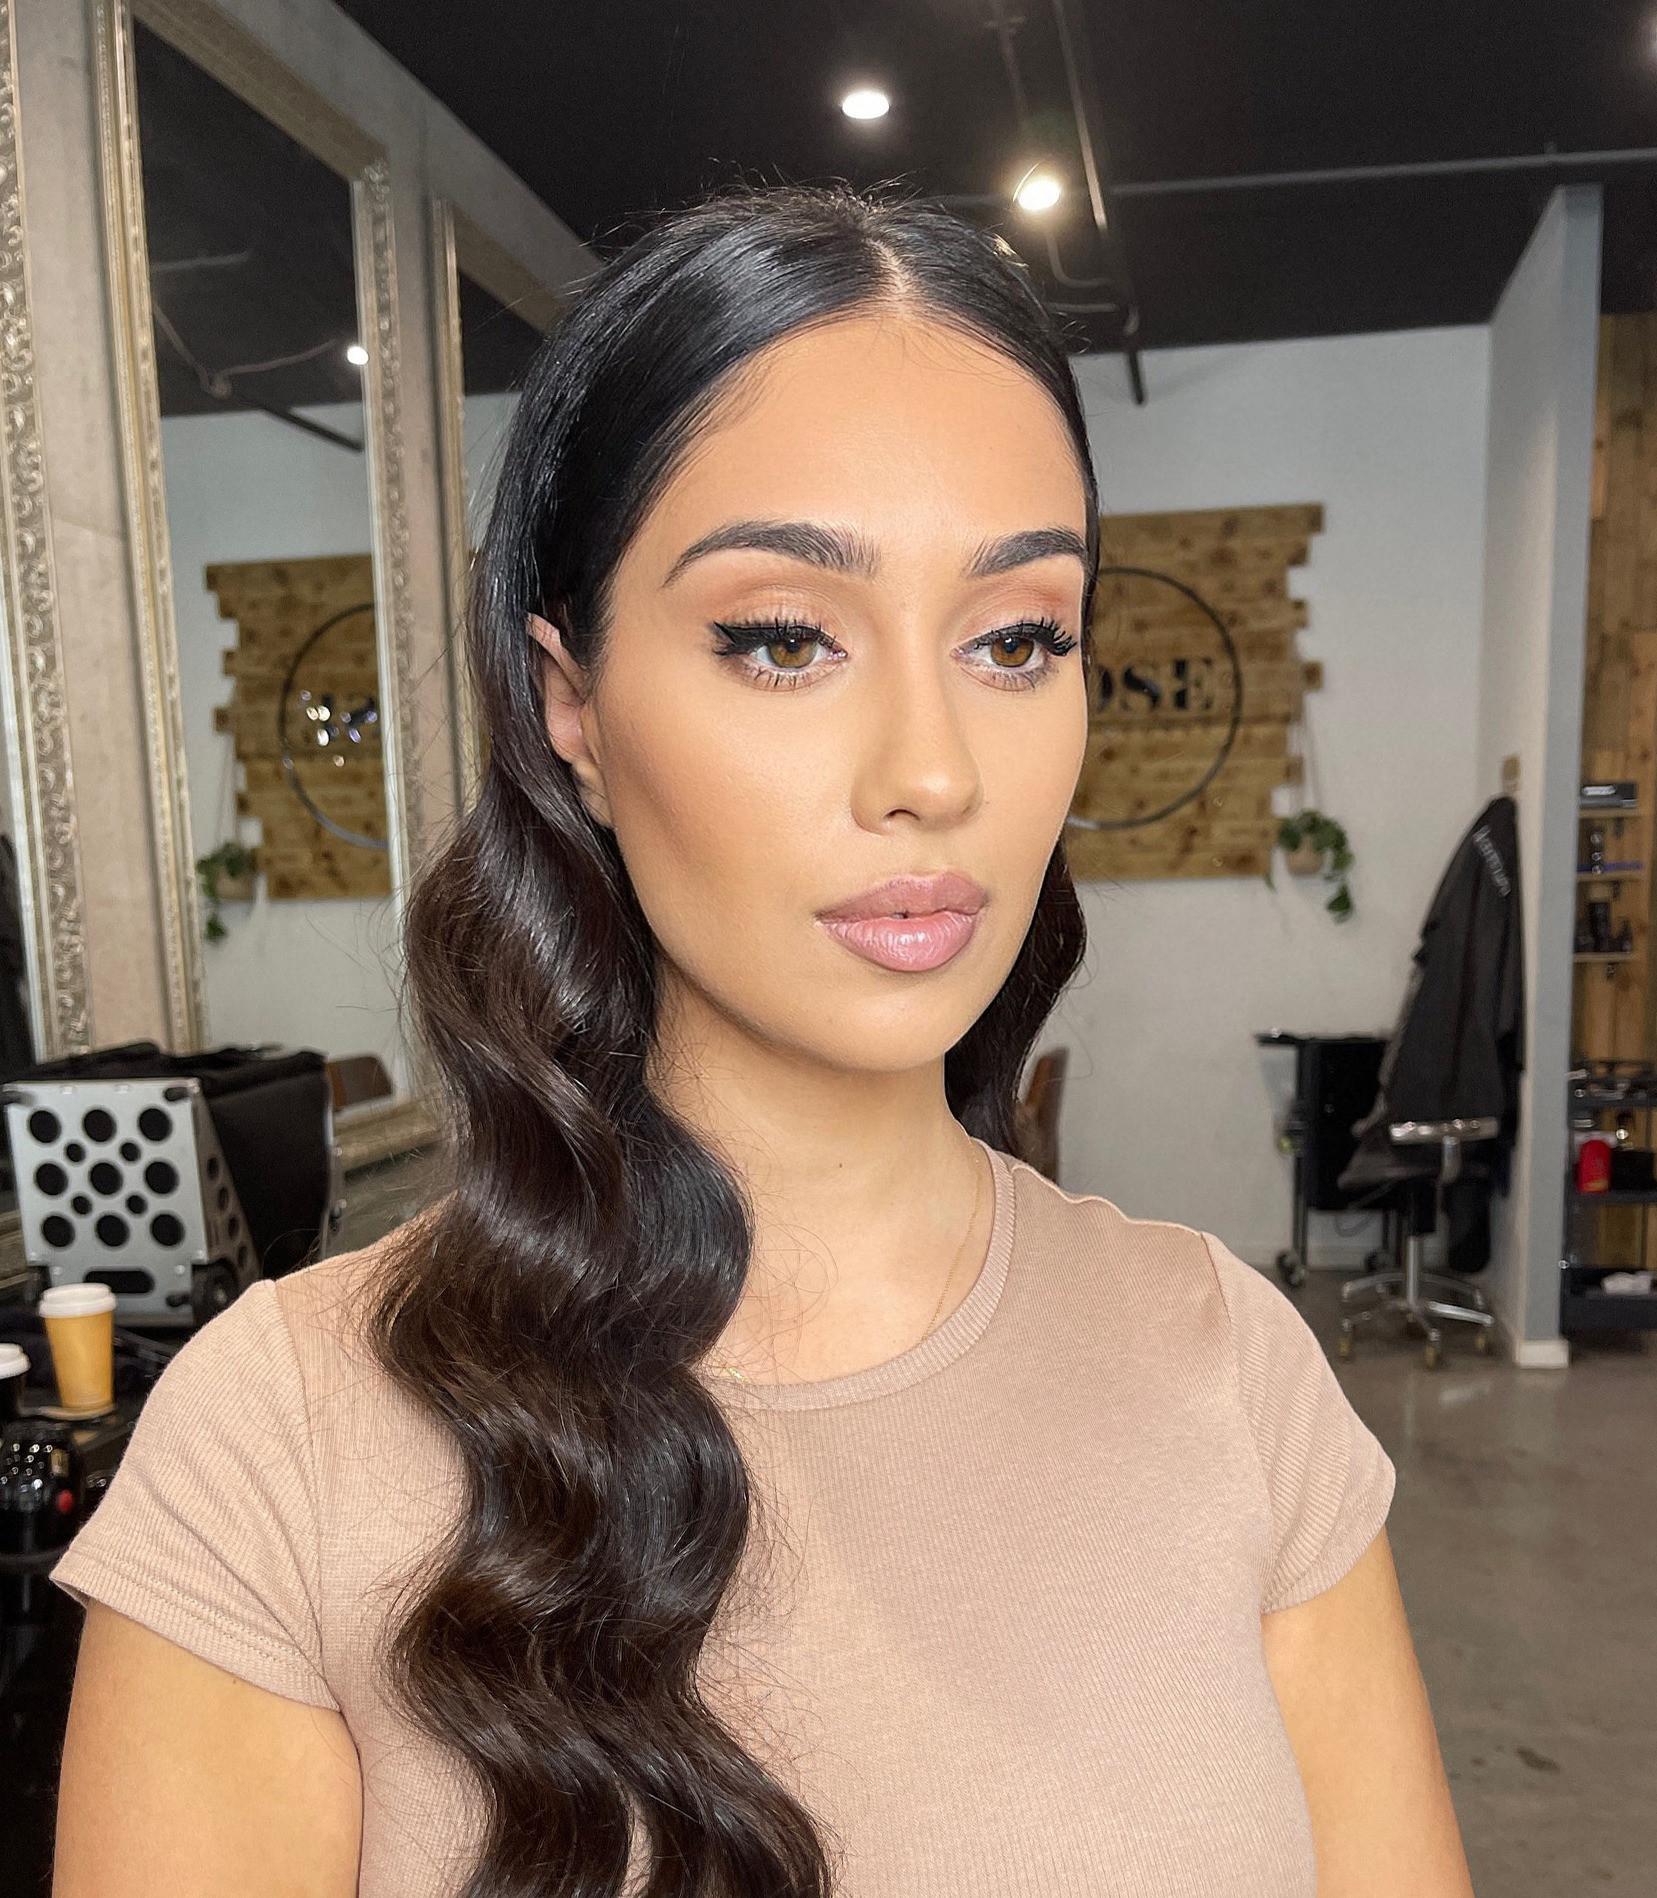 Glam Makeup + Hair Styling - Studio